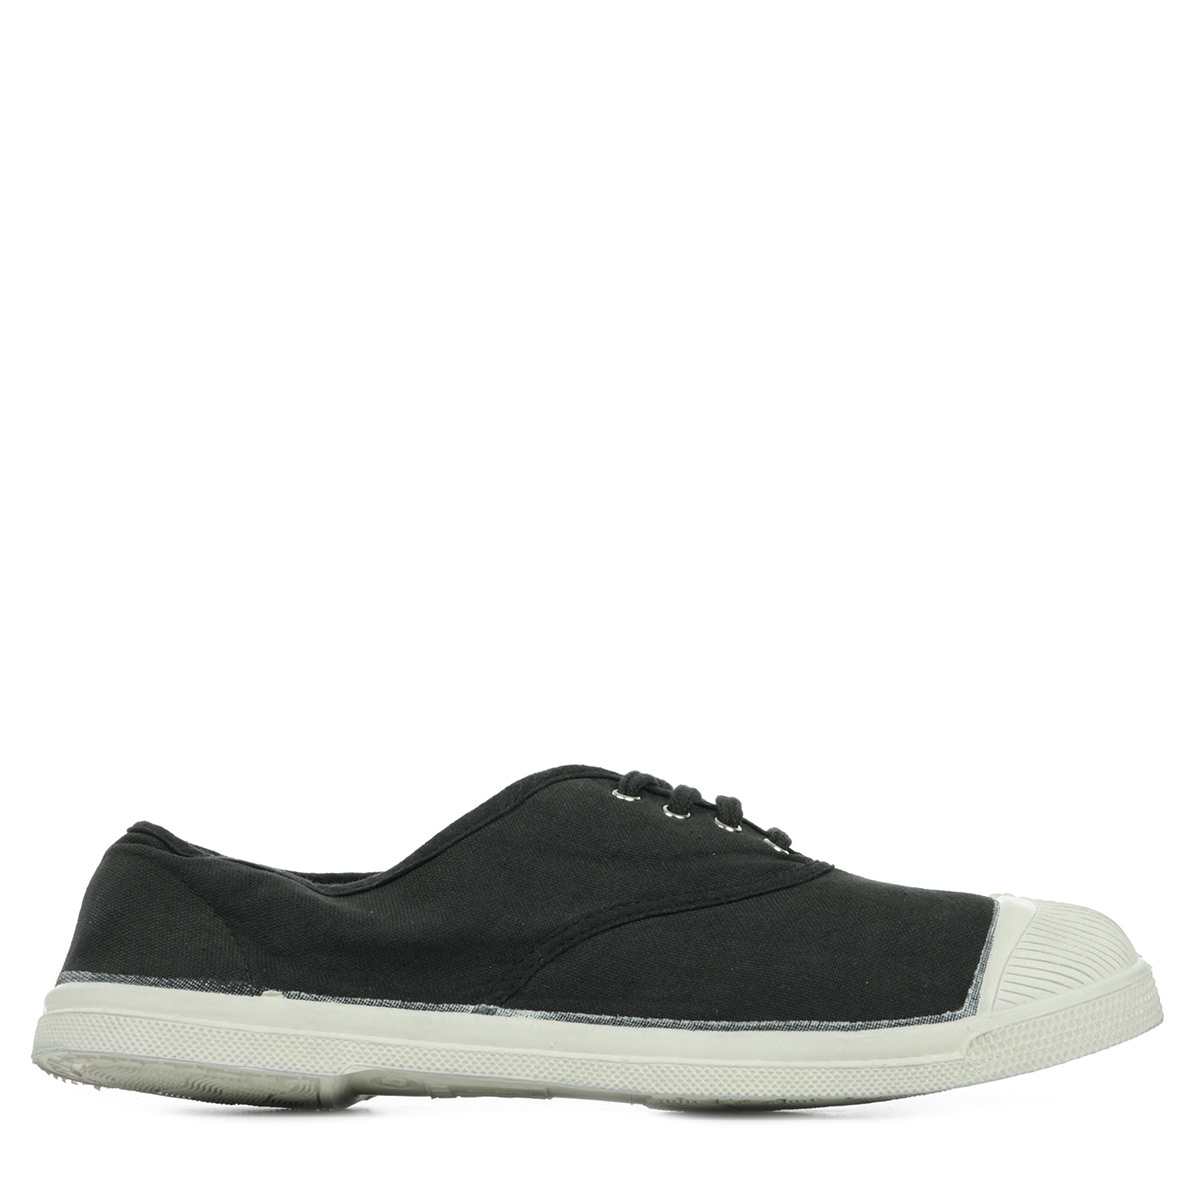 bensimon tennis lacets carbone h15004c157835 chaussures homme homme. Black Bedroom Furniture Sets. Home Design Ideas